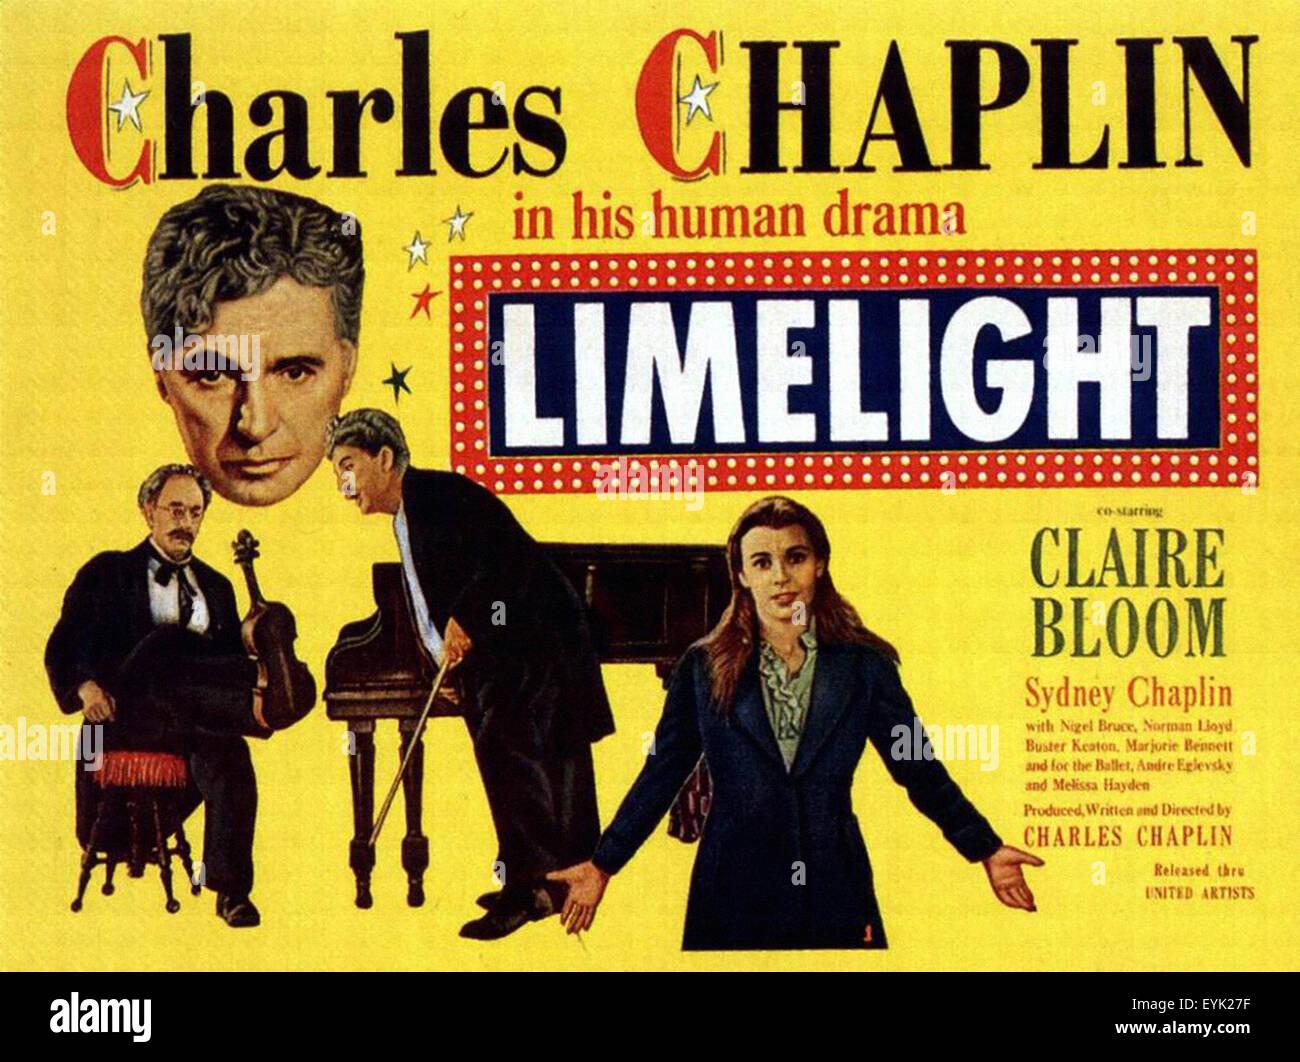 Limelight - Movie Poster Stock Photo: 85856051 - Alamy